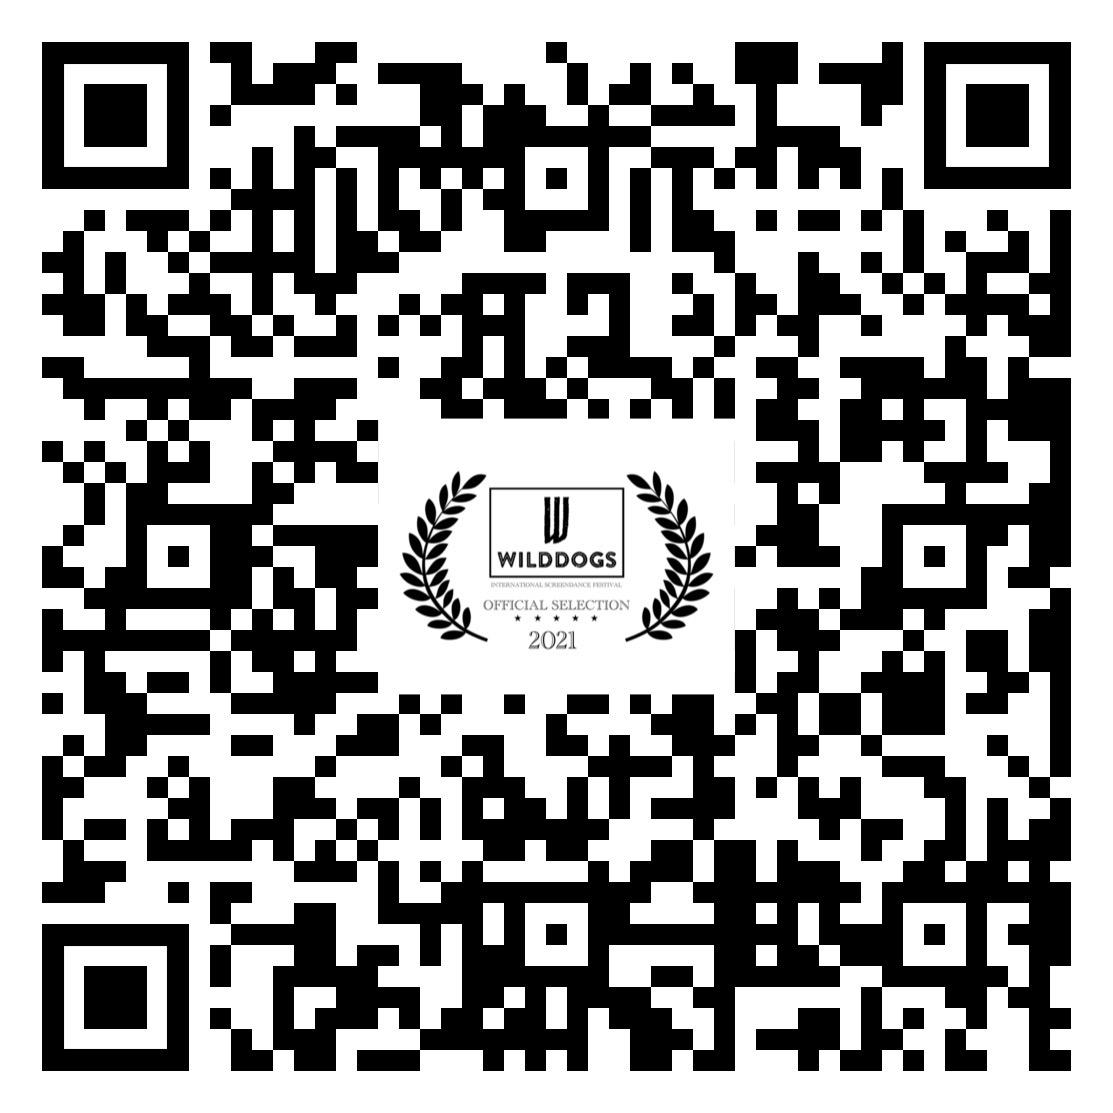 QR Code for WildDogs Program